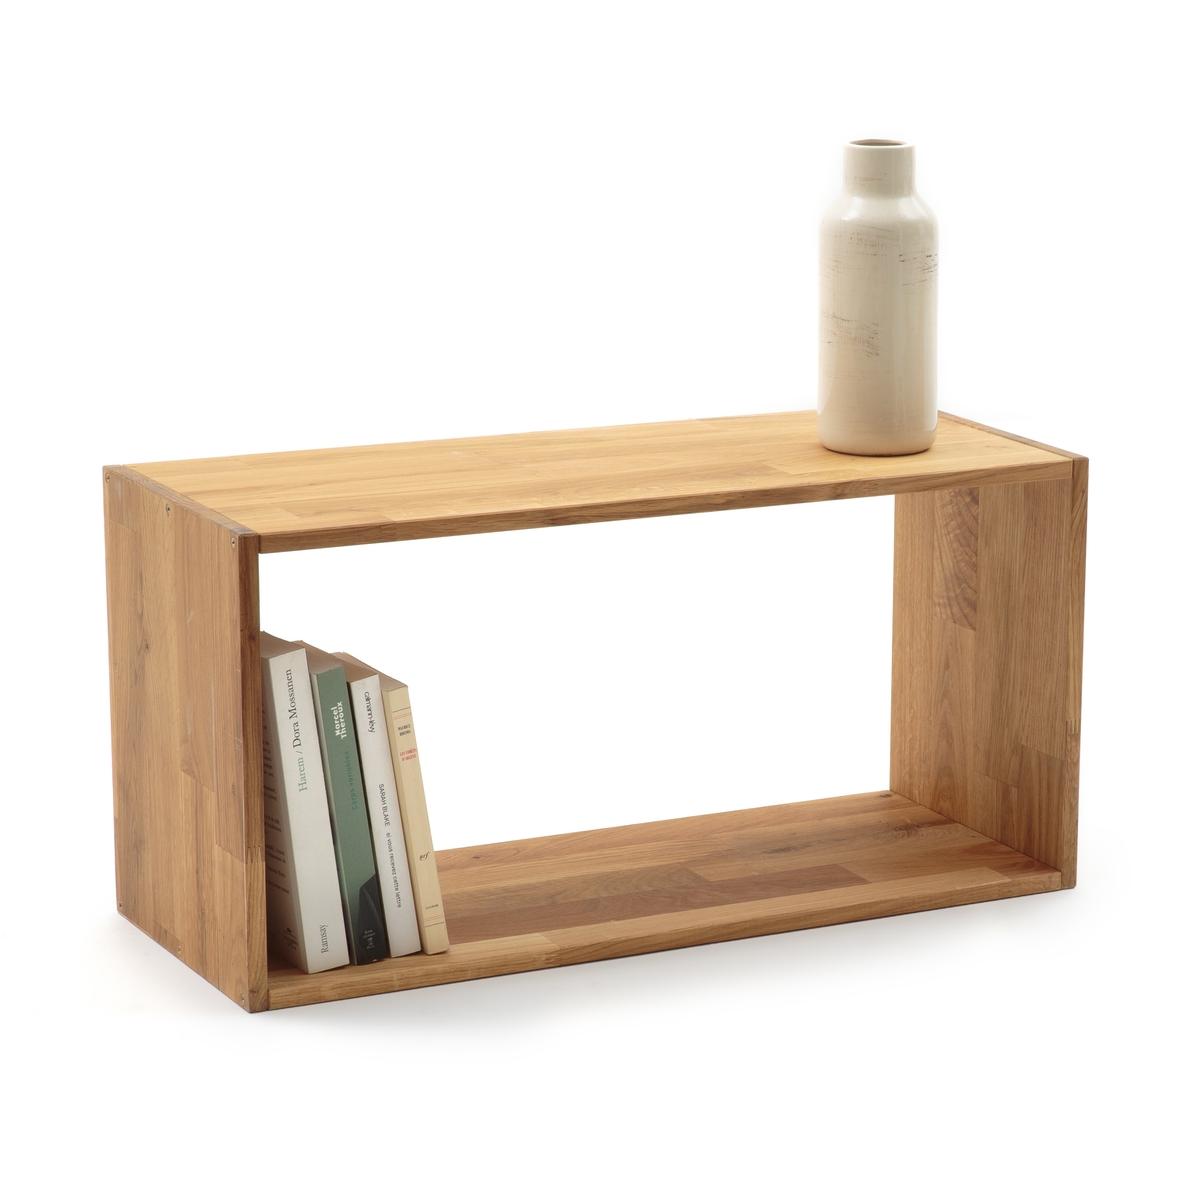 Этажерка модульная из массива дуба, Edgar этажерка модульная с 2 ящиками из массива дуба edgar